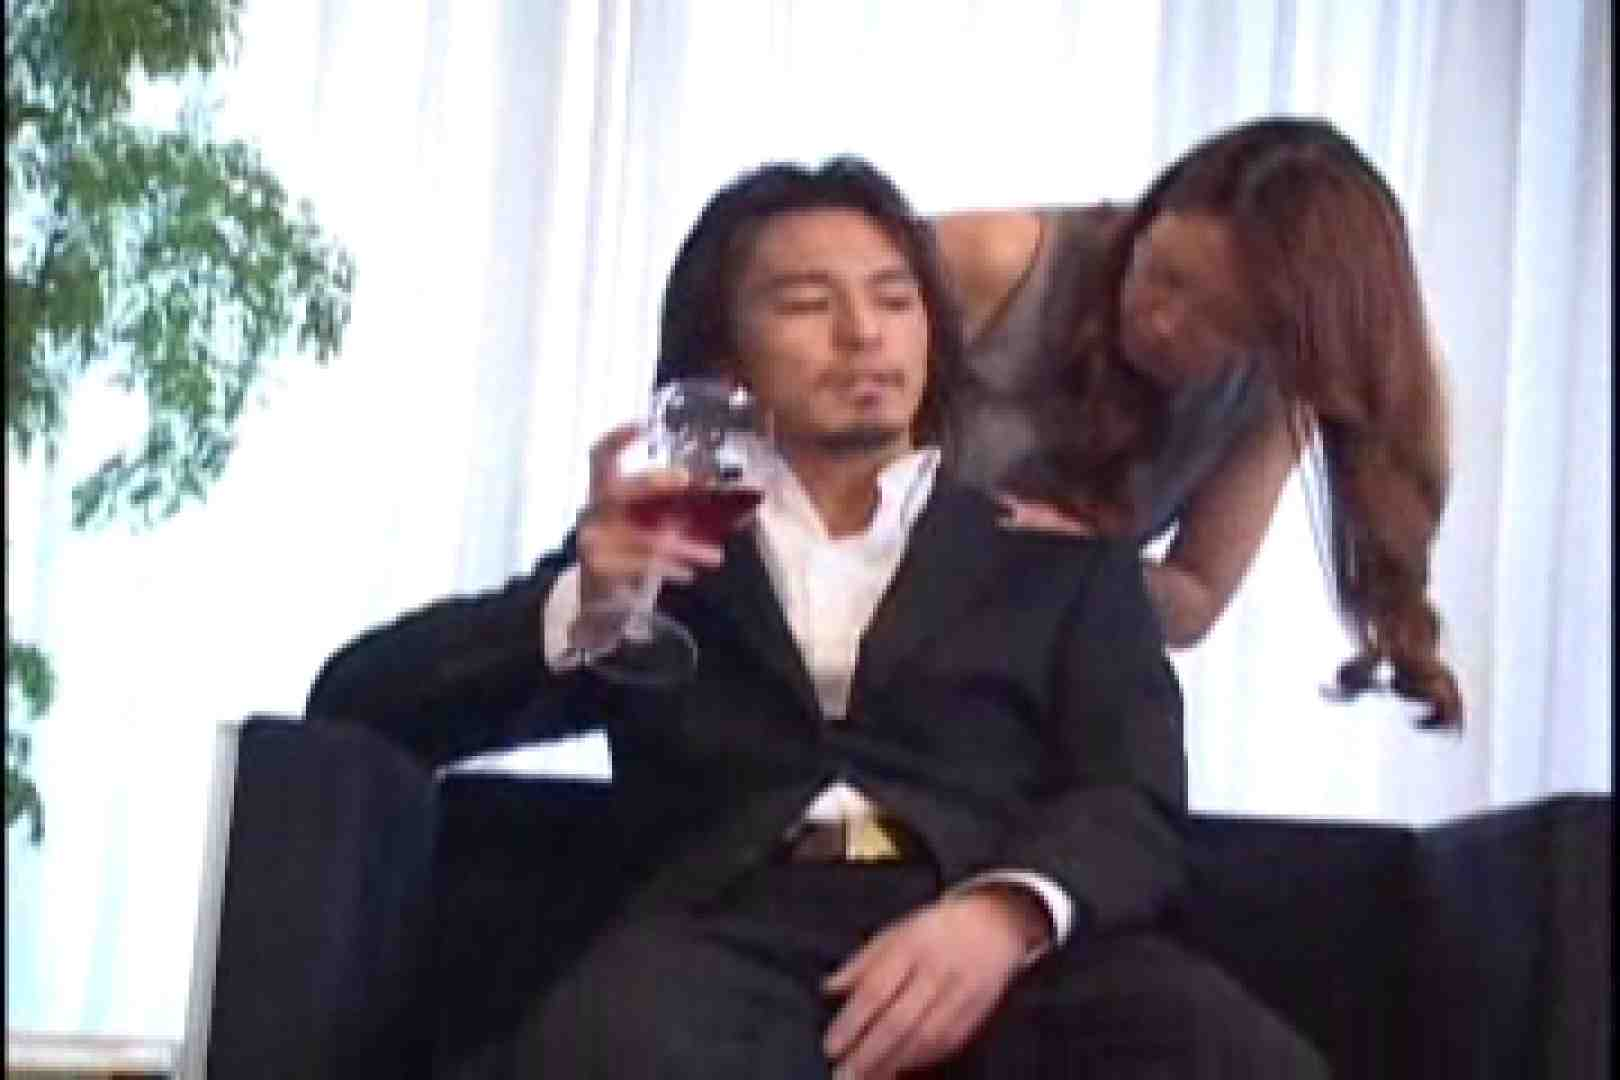 BEST OF イケメン!!男目線のガチSEX vol.06(対女性作品) ディープキス | 対女性 チンコ画像 14連発 1